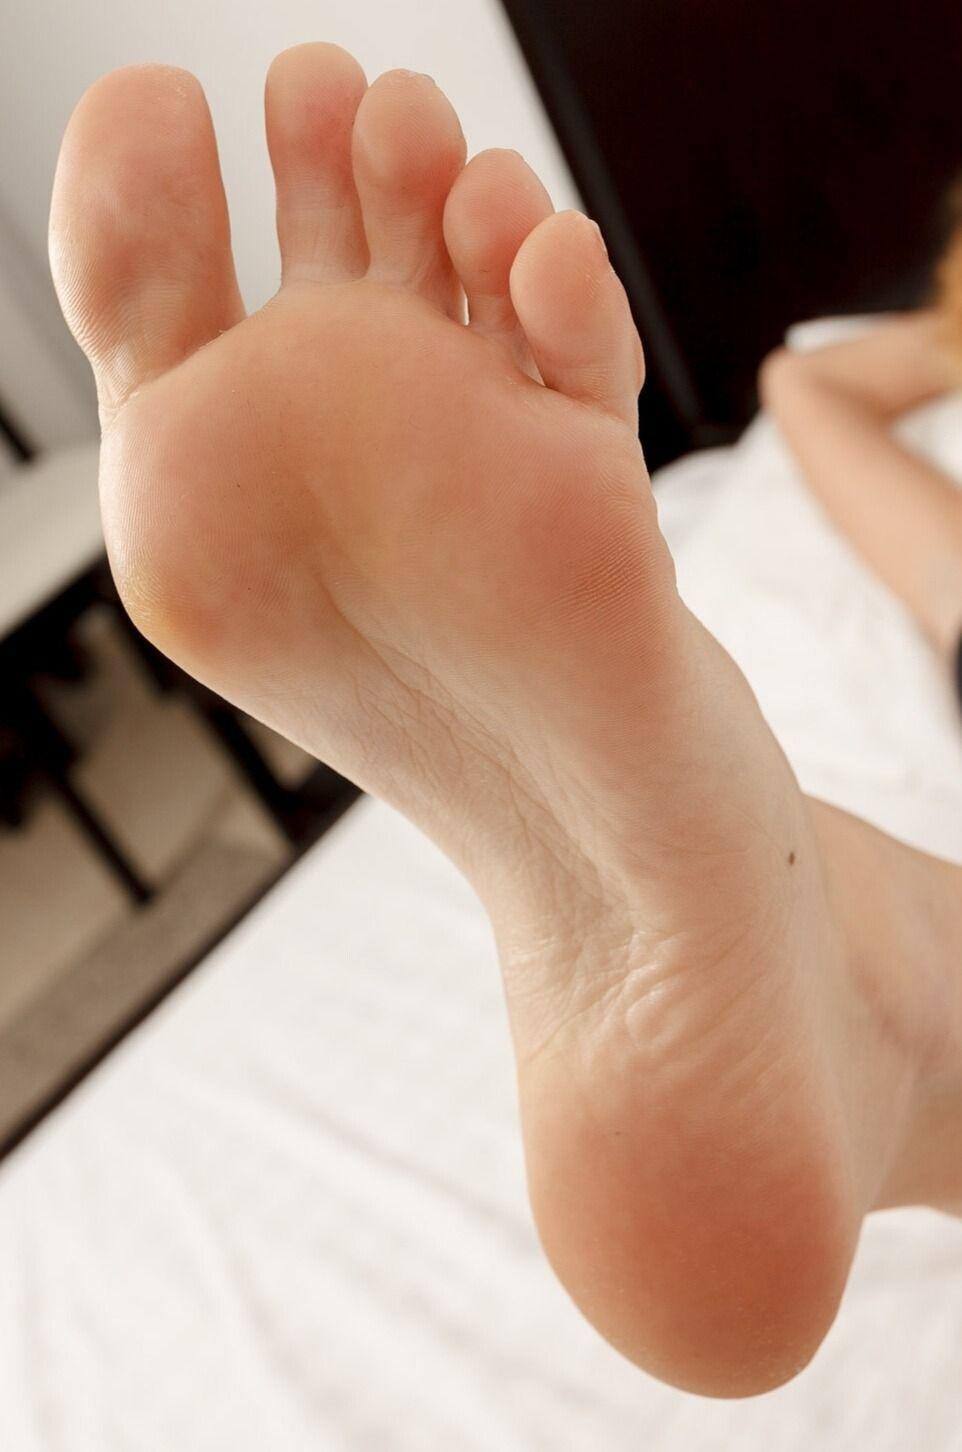 Lesbian Foot Fetish Daily Hd